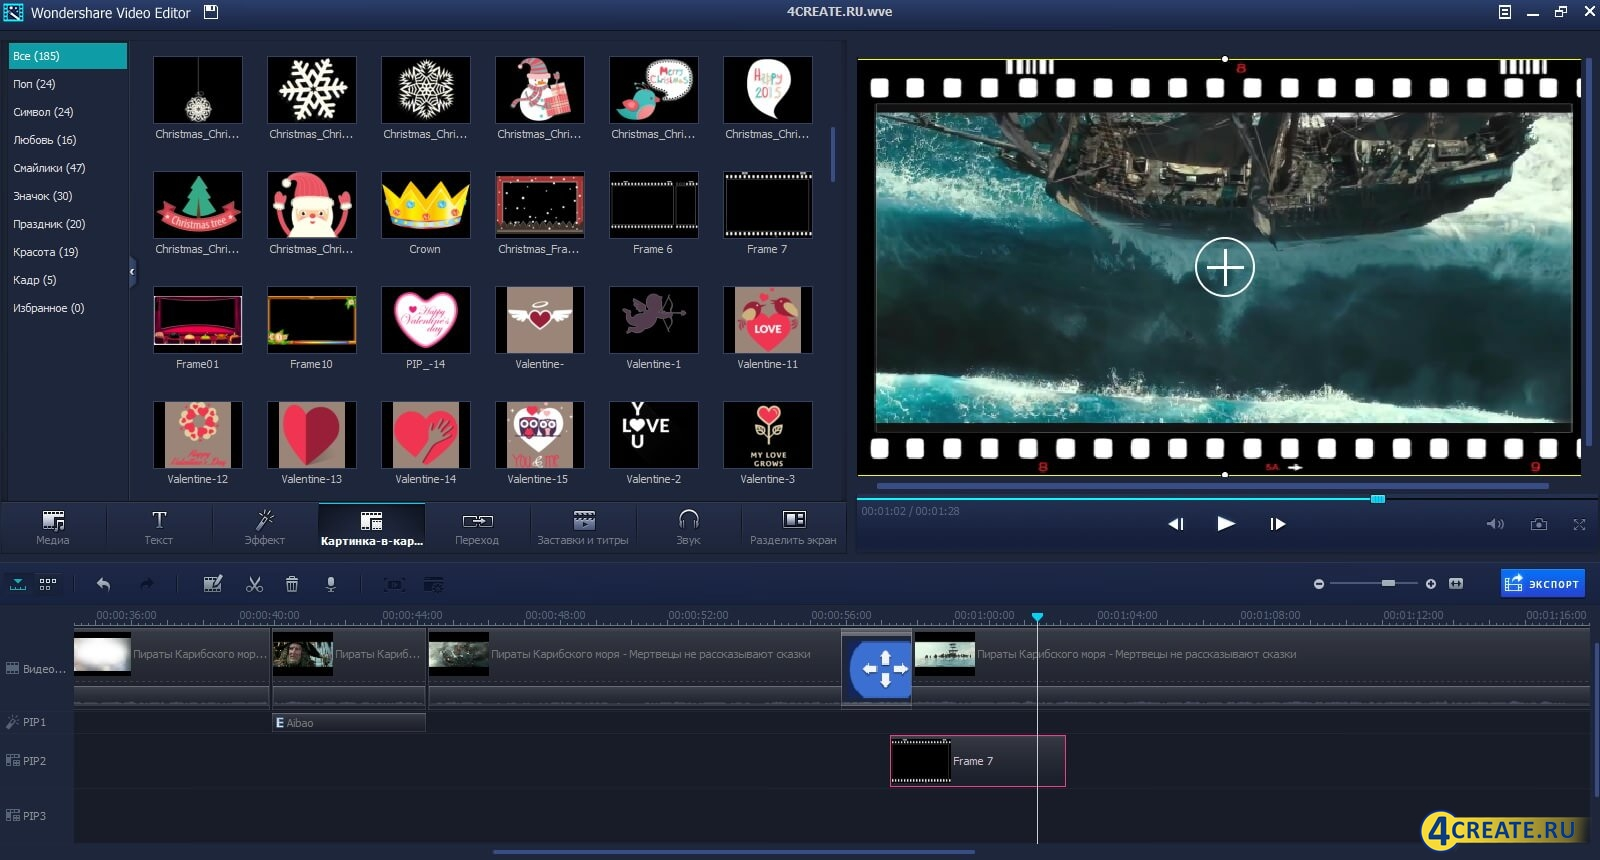 Wondershare Video Editor 5.1 (Скриншот 4)